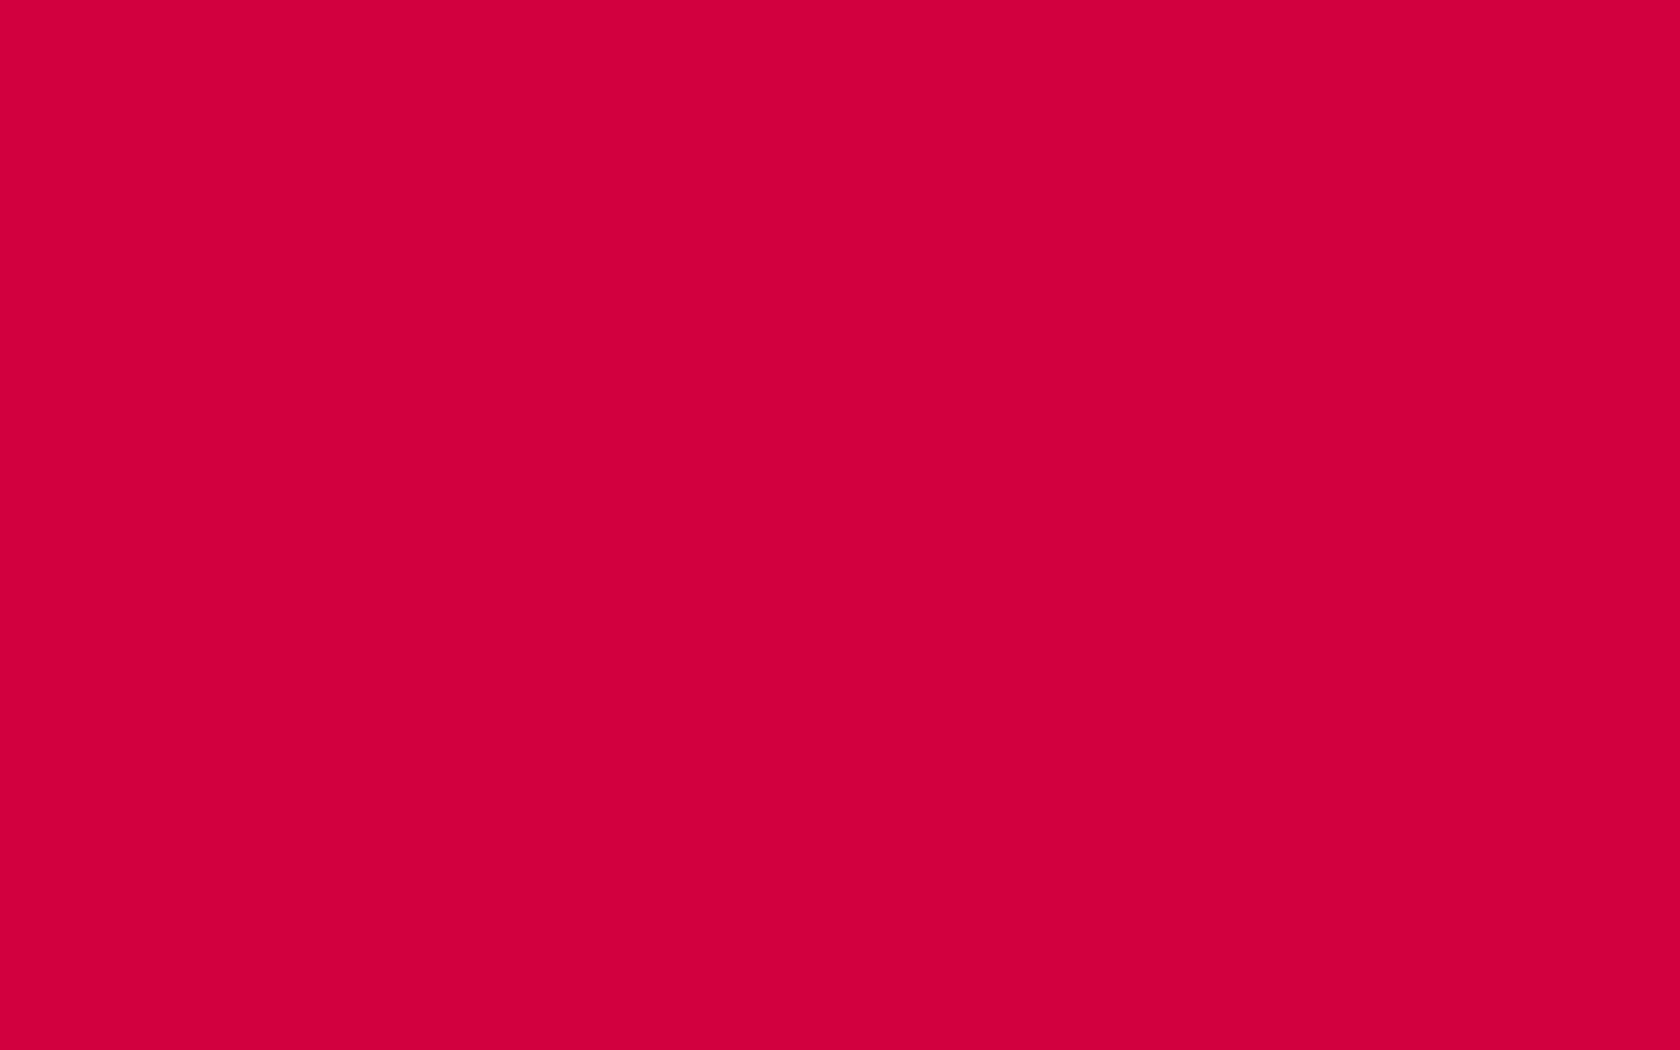 1680x1050 Utah Crimson Solid Color Background